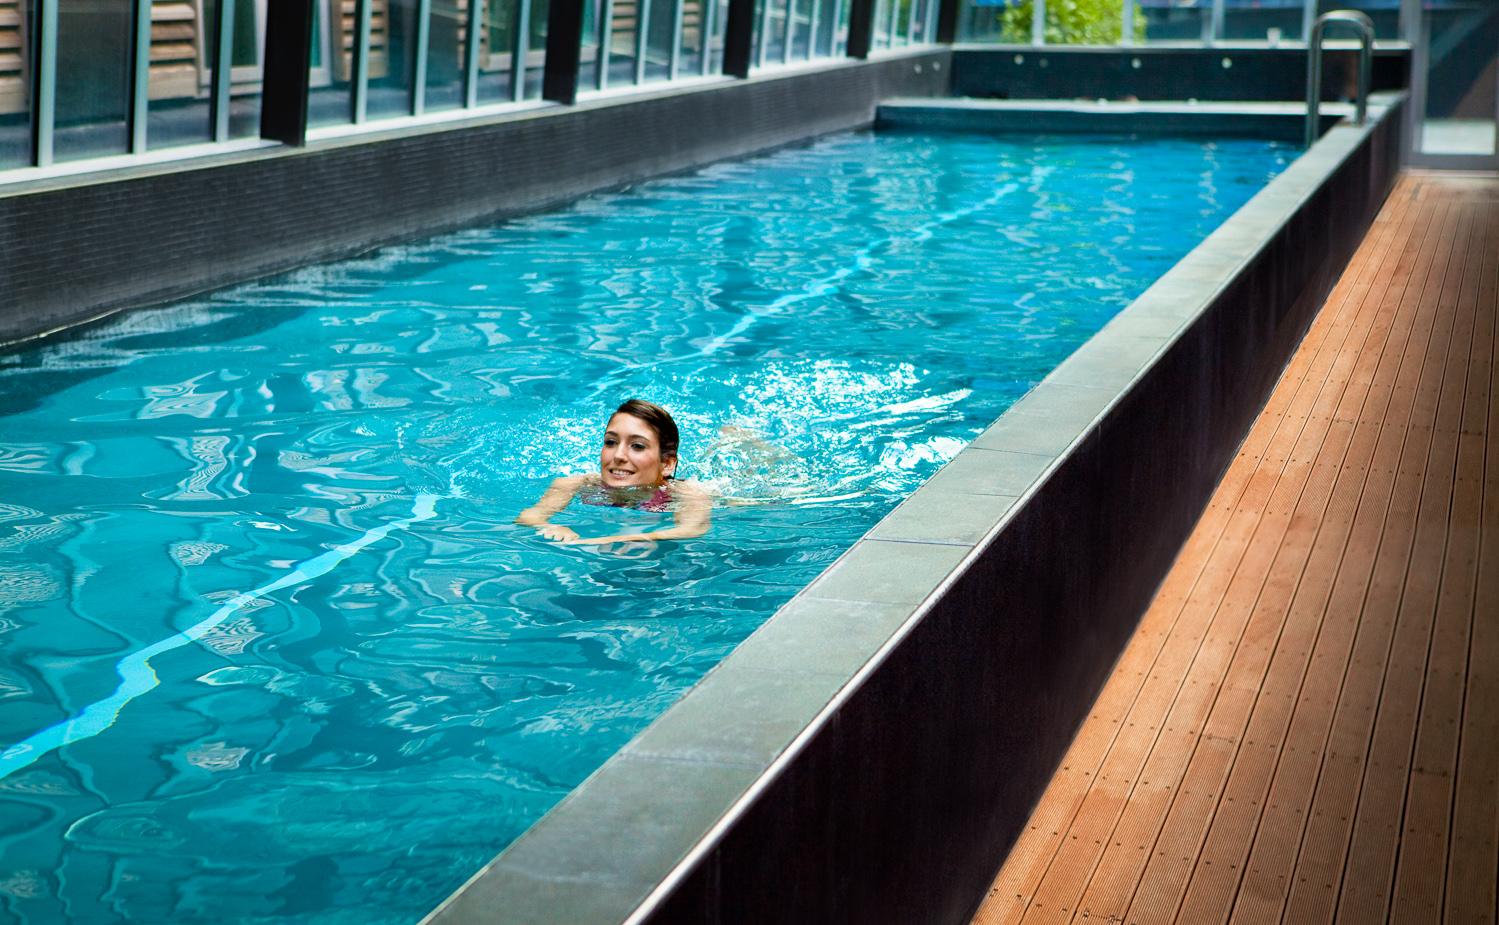 pool-hotel-Wellington-photographer-Paul-Fisher.jpg